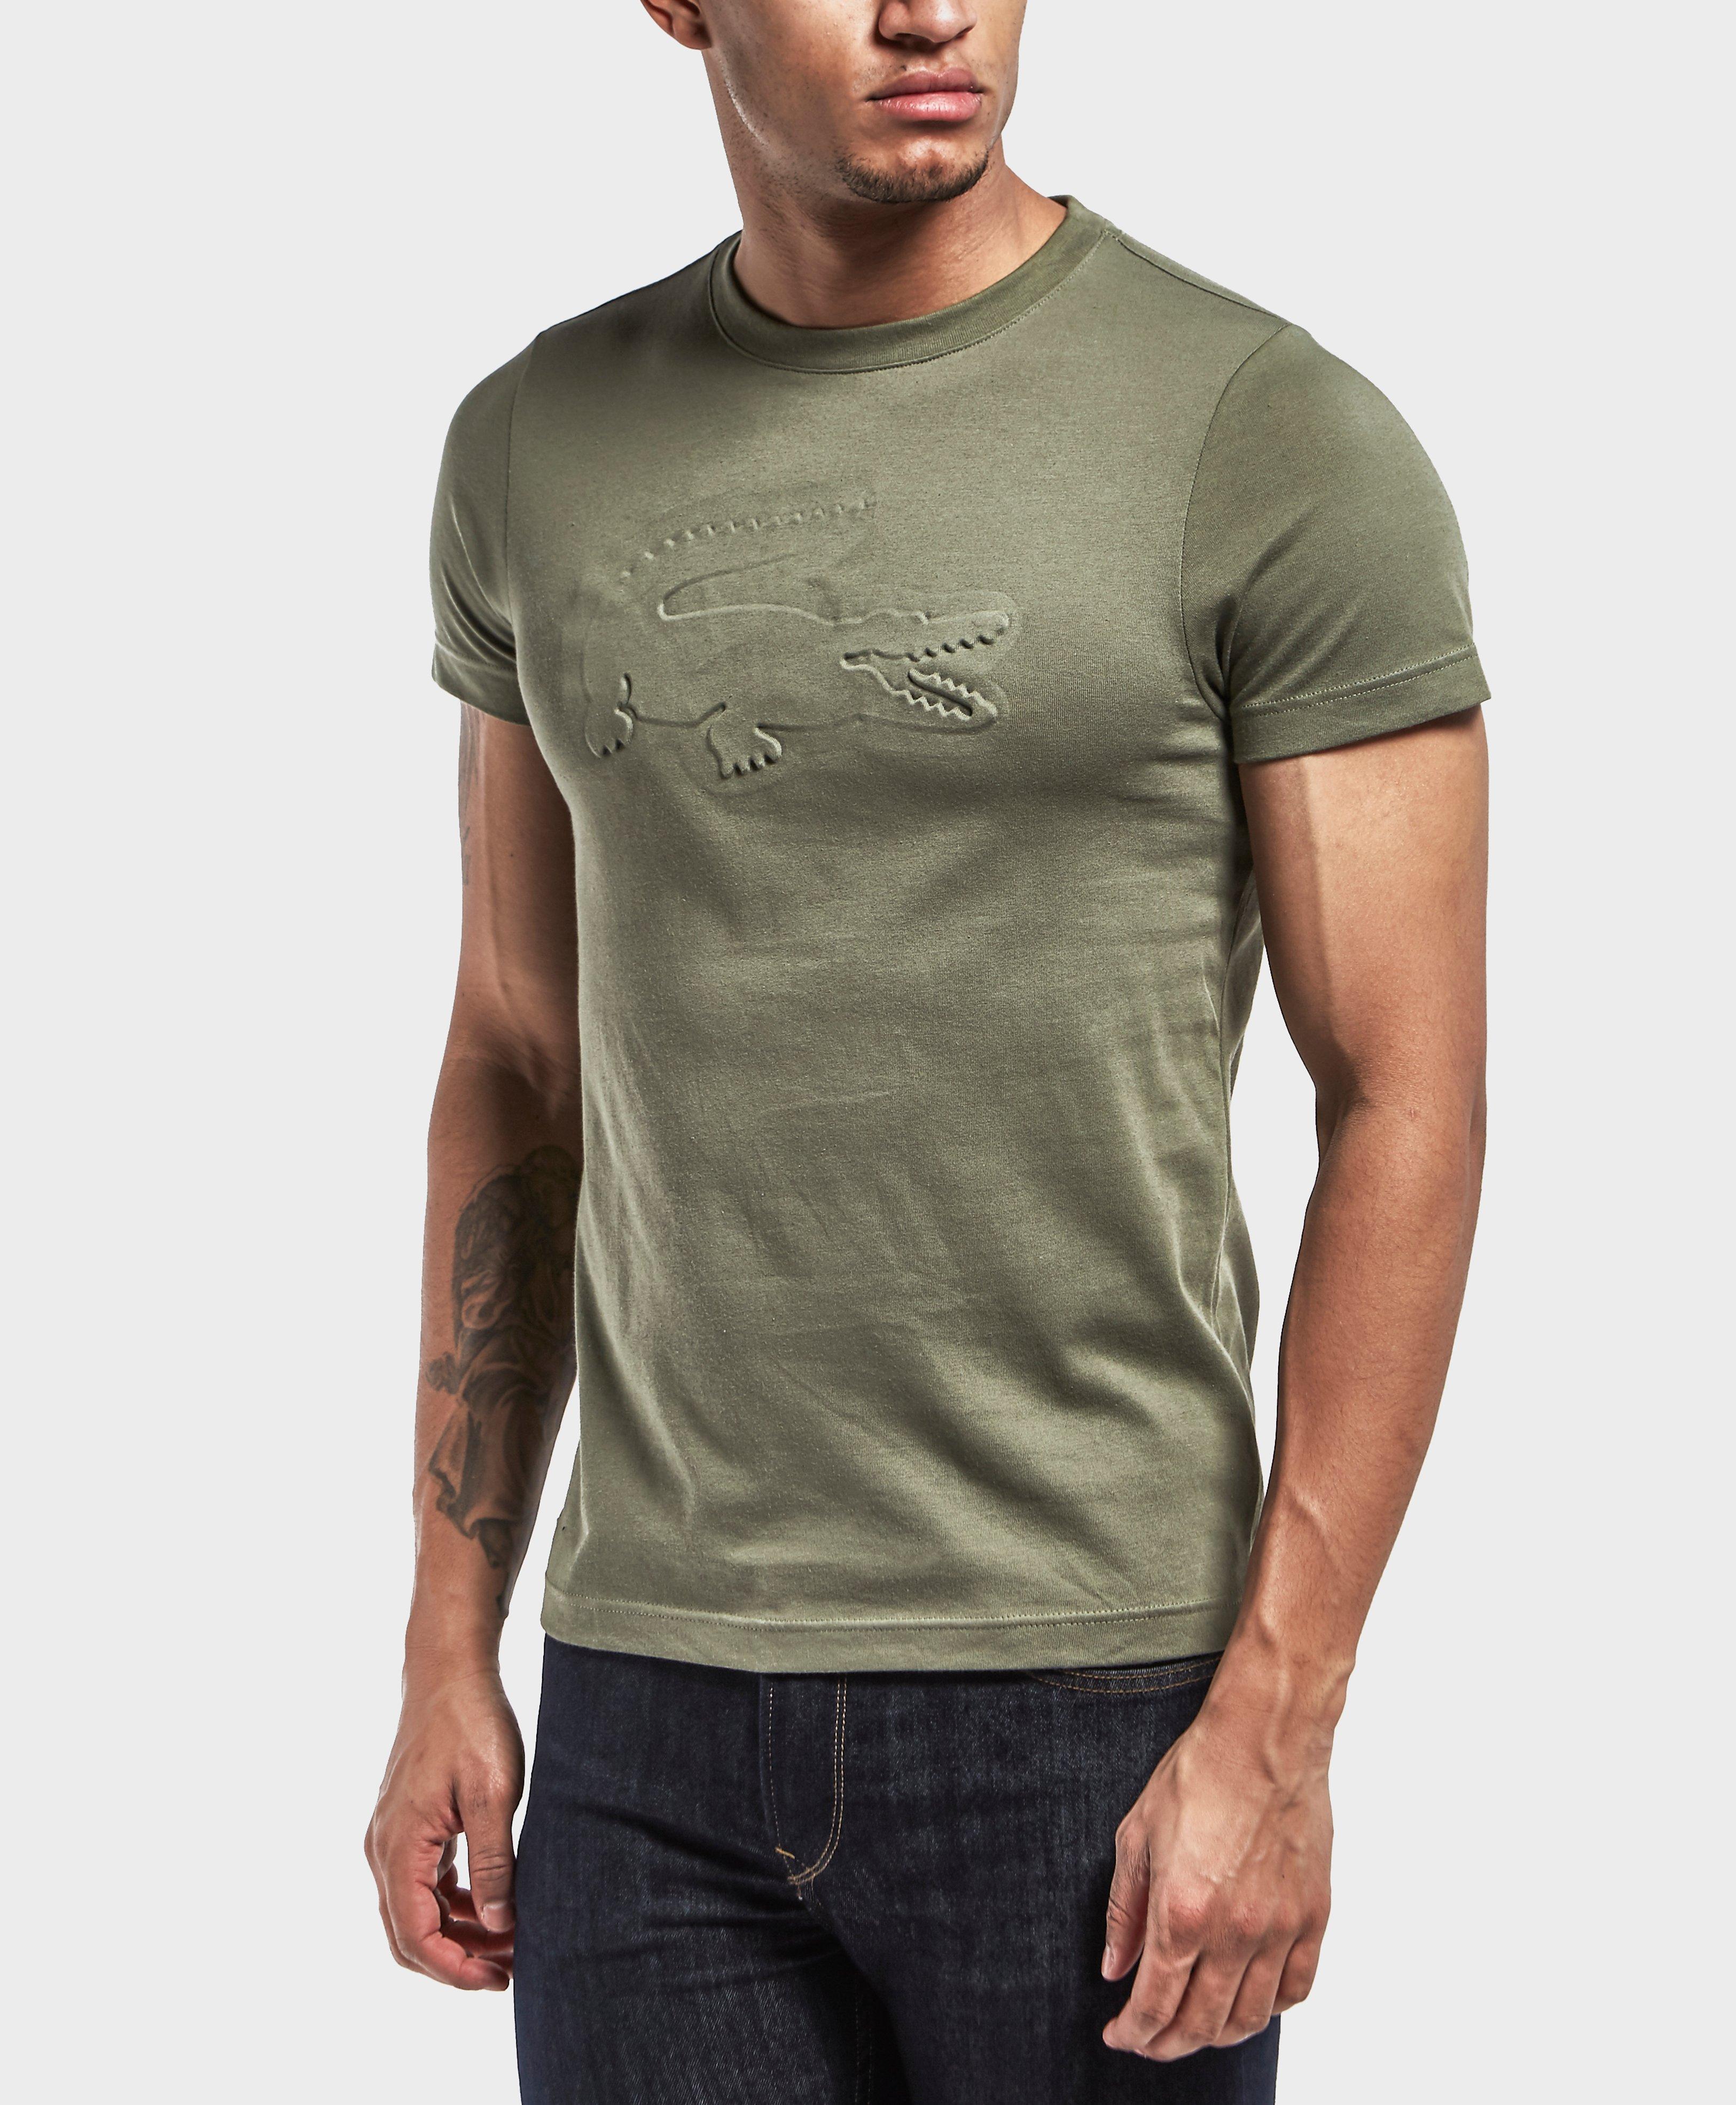 lyst lacoste embossed croc short sleeve t shirt in green. Black Bedroom Furniture Sets. Home Design Ideas